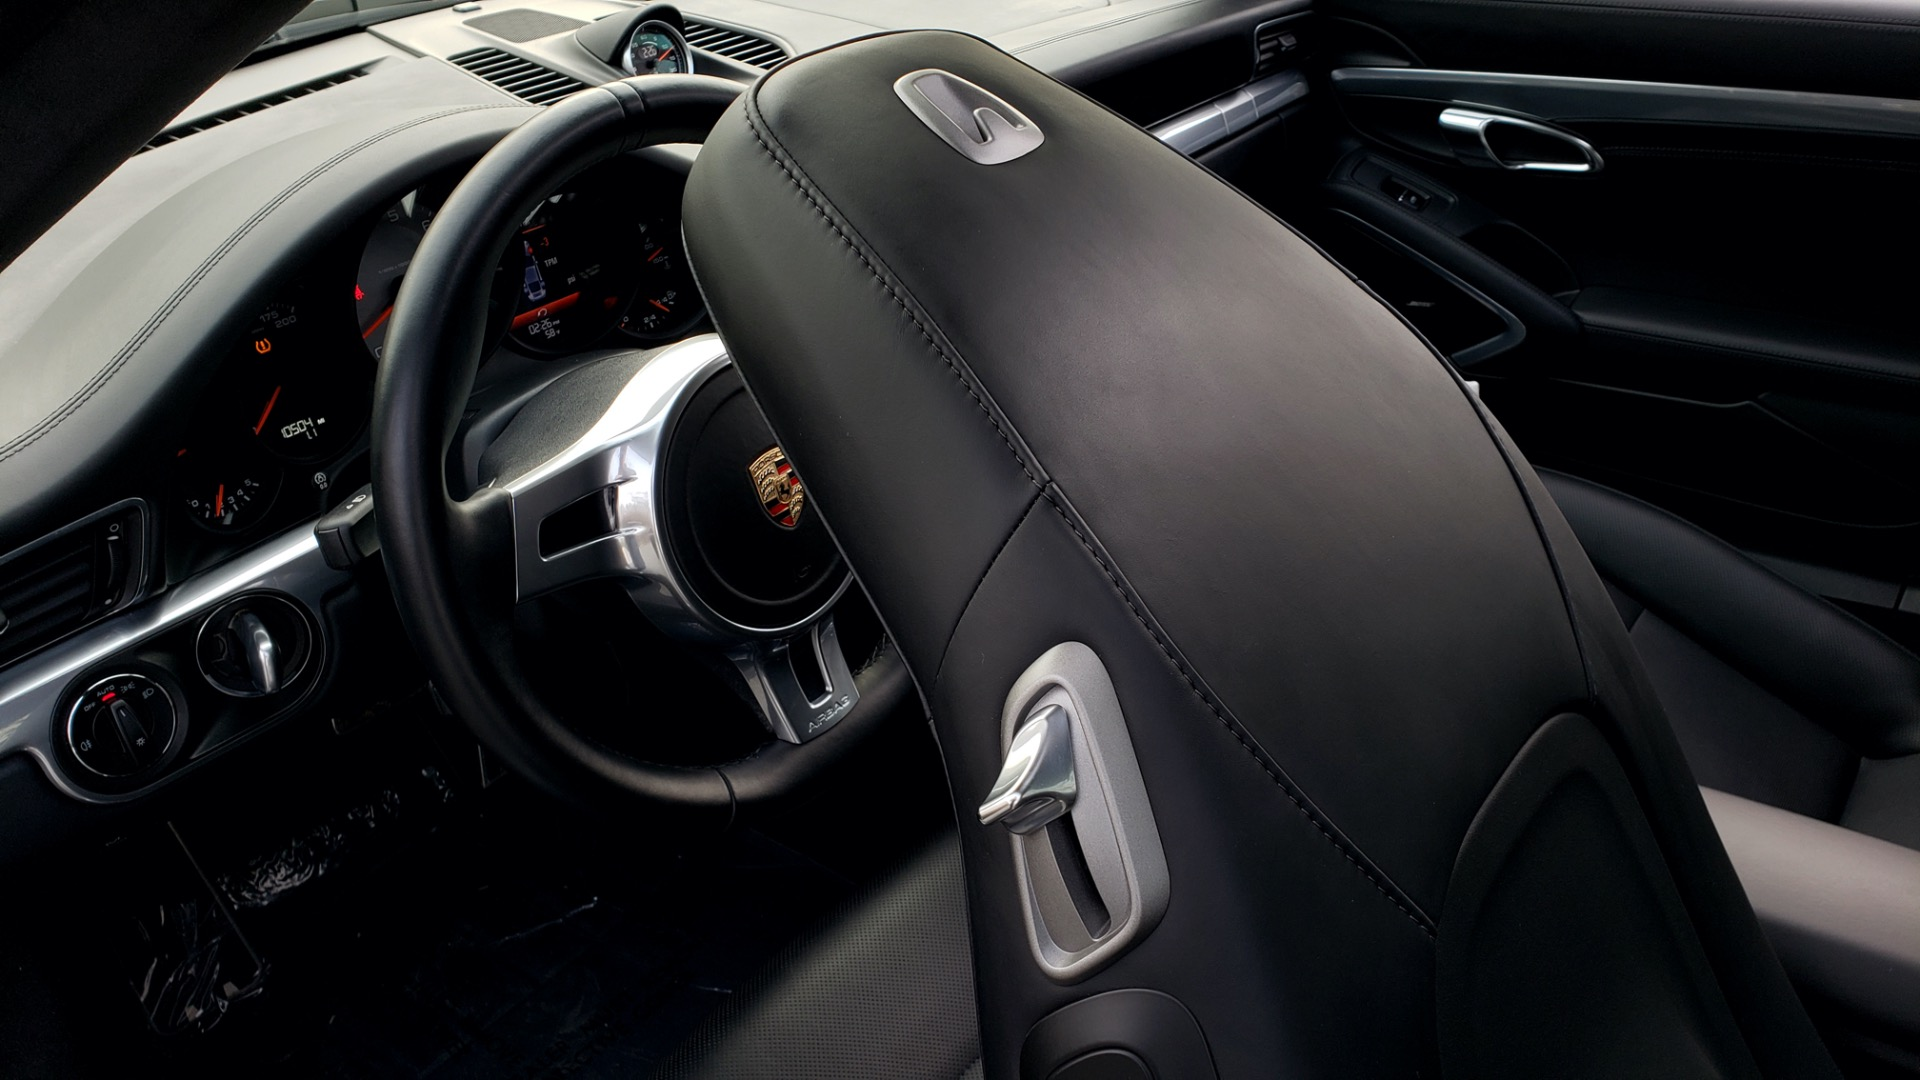 Used 2014 Porsche 911 CARRERA 4S / PREM PKG PLUS / NAV / SUNROO / BOSE / CHRONO for sale Sold at Formula Imports in Charlotte NC 28227 60